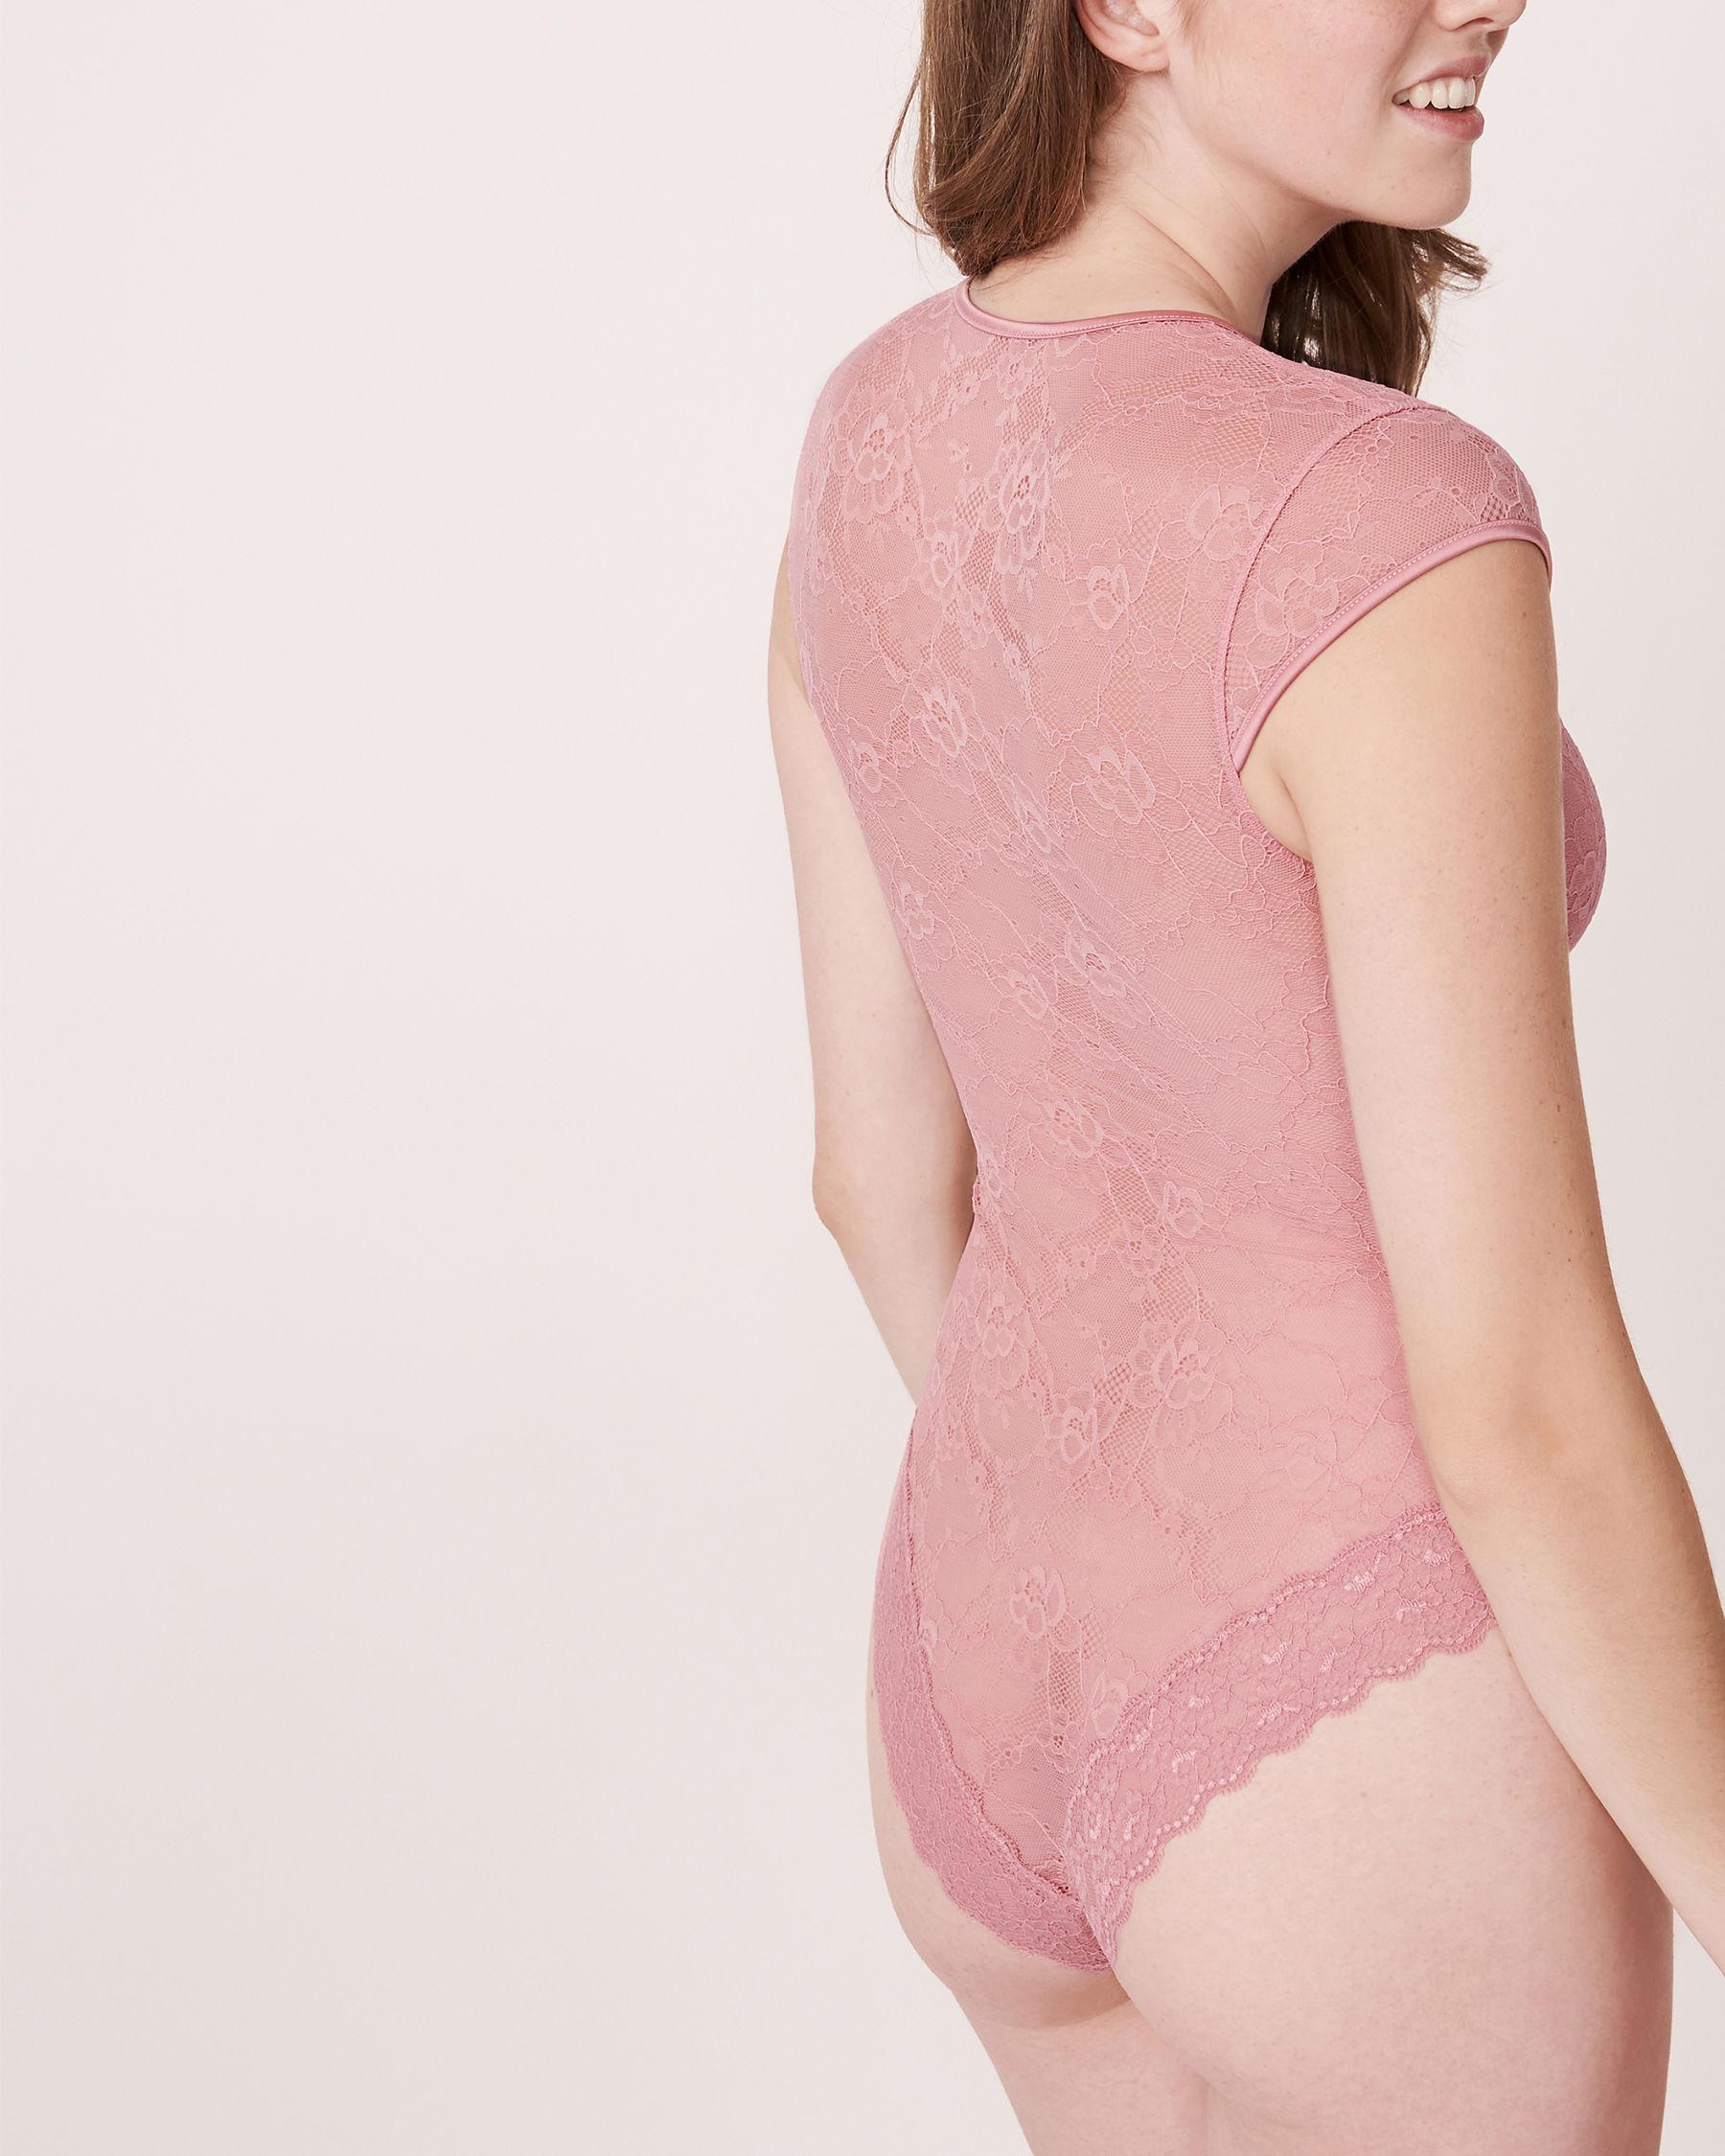 LA VIE EN ROSE Lace and Mesh Teddy Pink 760-441-0-11 - View2